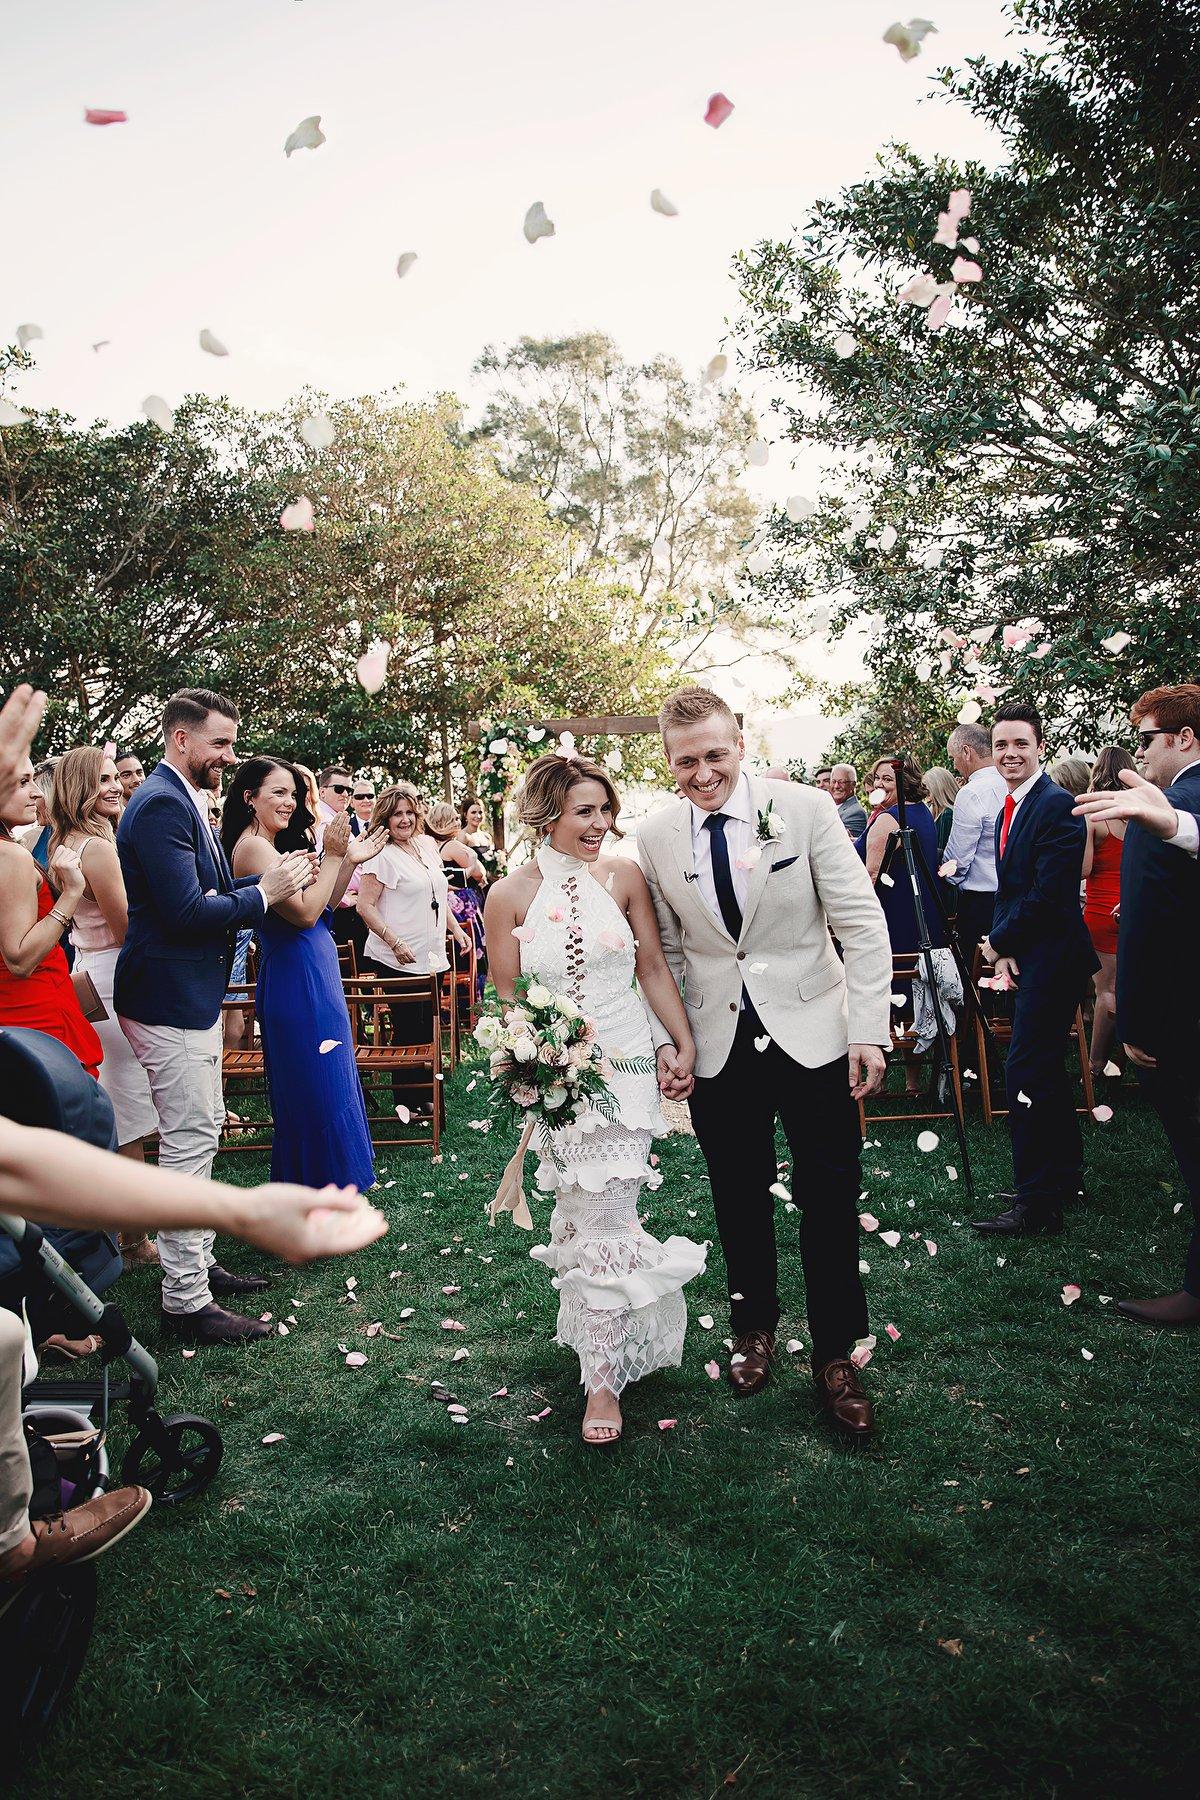 Wedding Ceremomy Little Manly Point Boho Rustic Bride.jpg